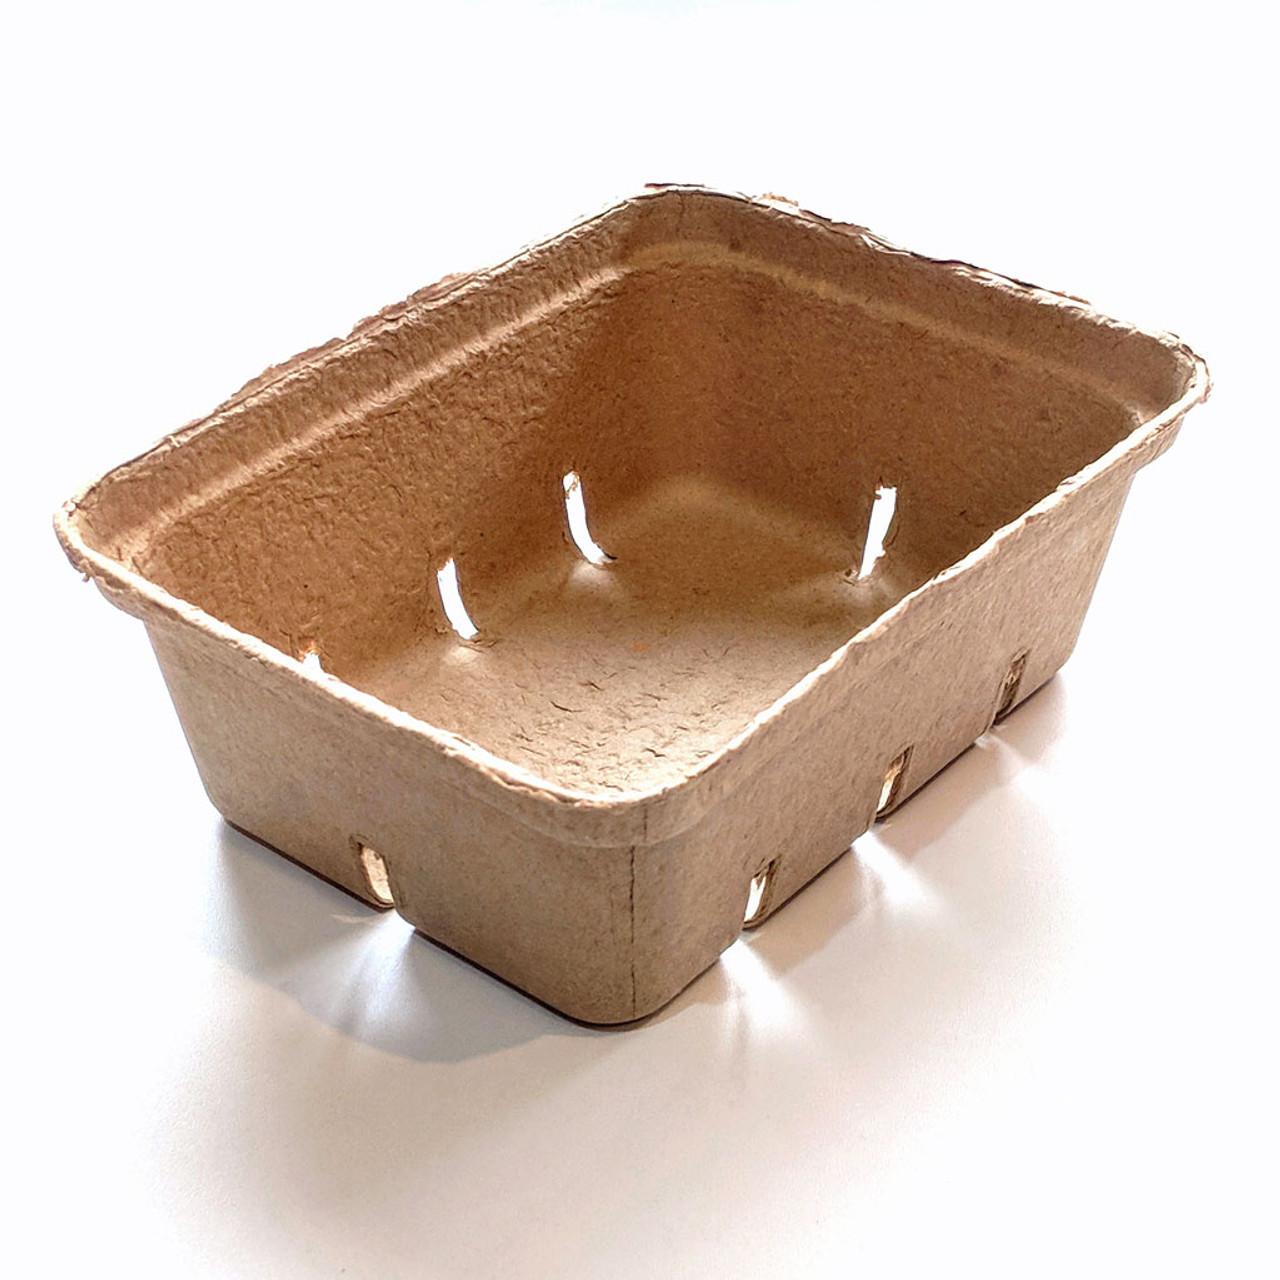 1.5 Quart Paper Molded Berry / Produce Basket